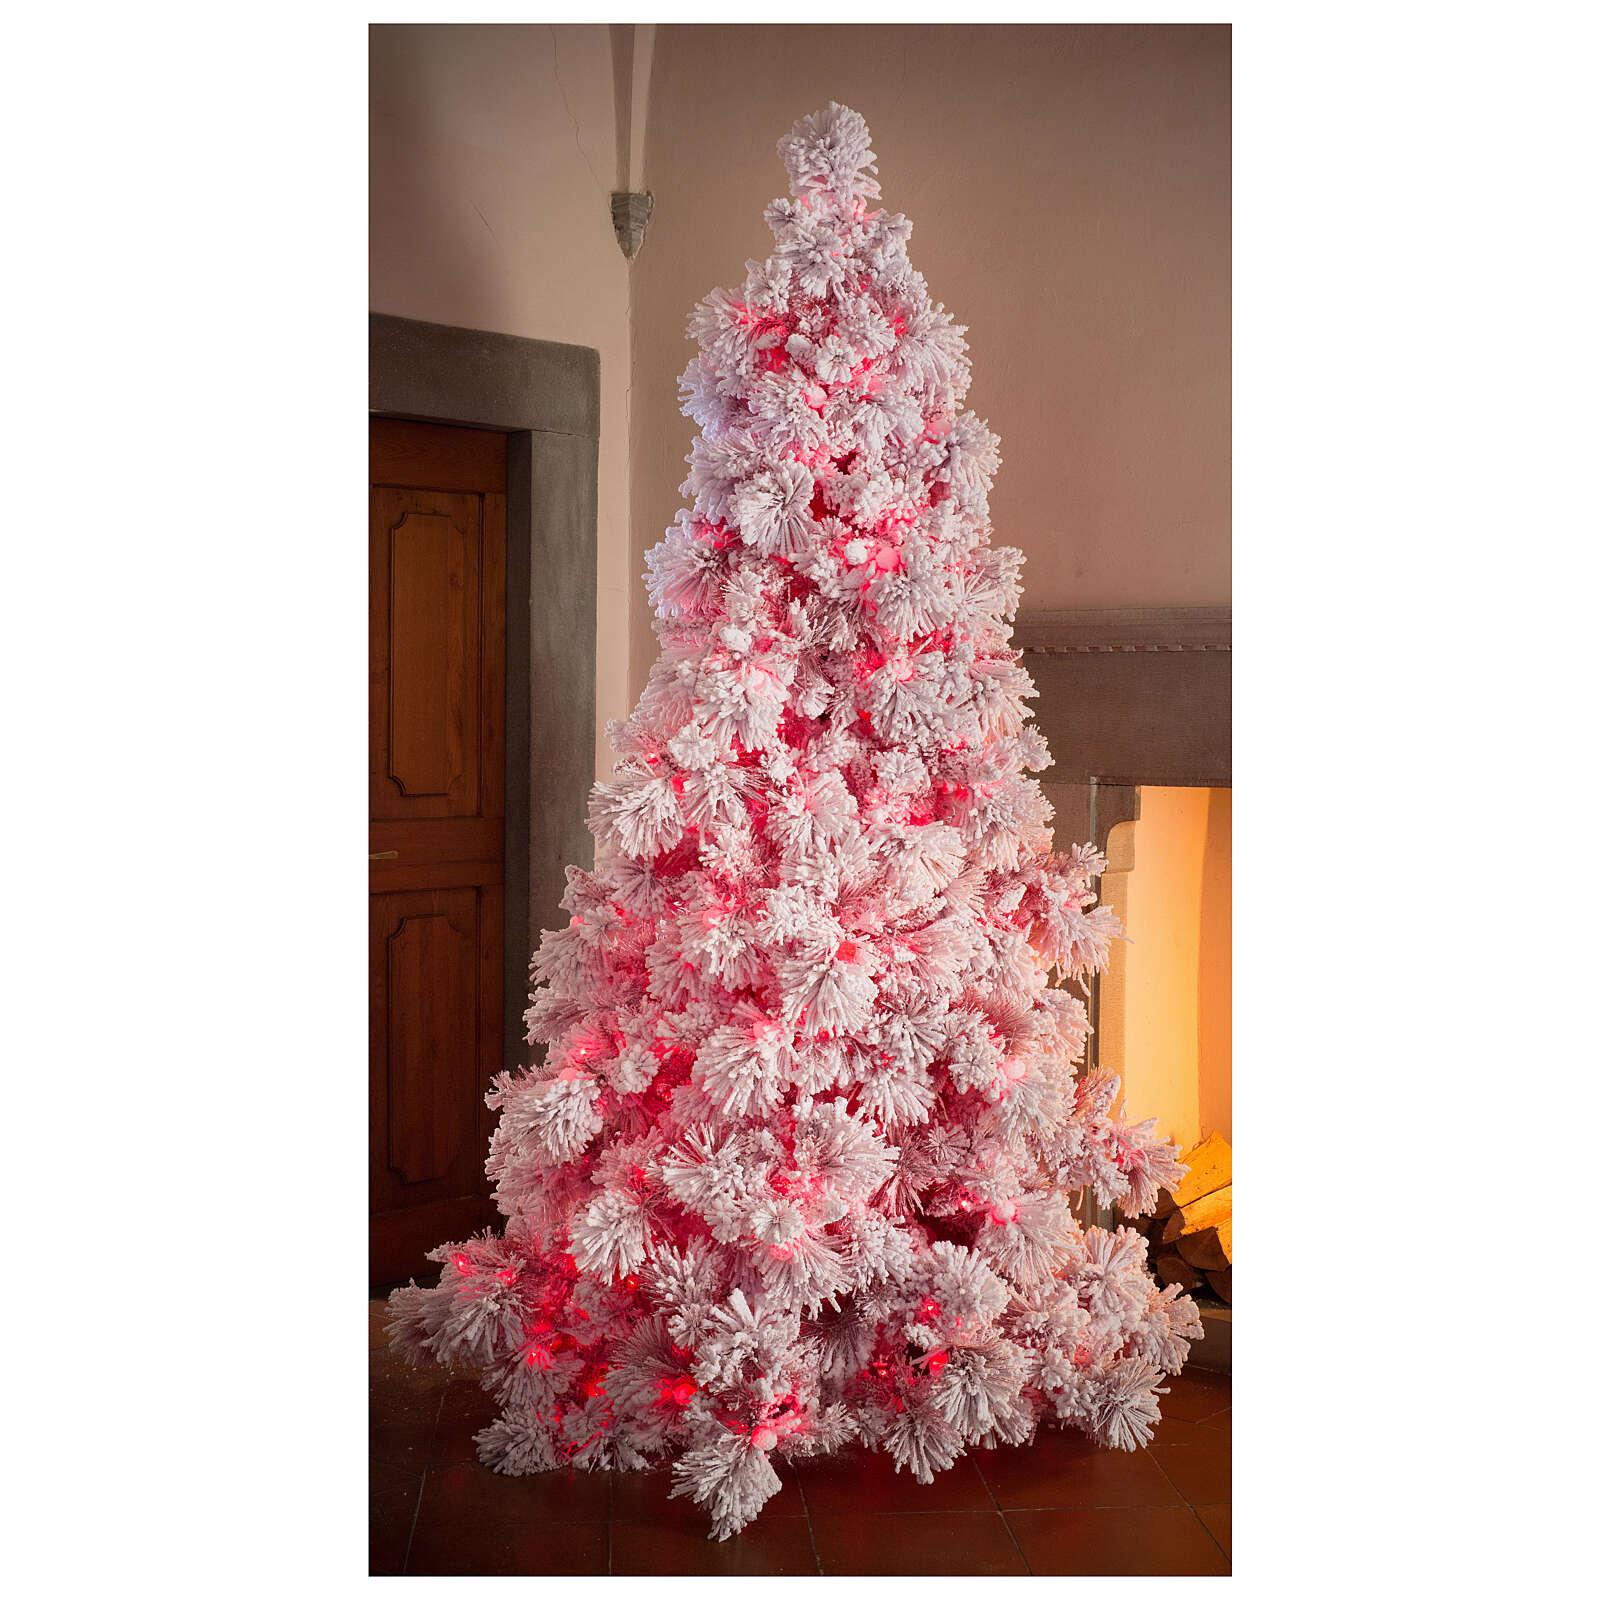 STOCK Albero di Natale 340 cm innevato Red Velvet 1050 led 3